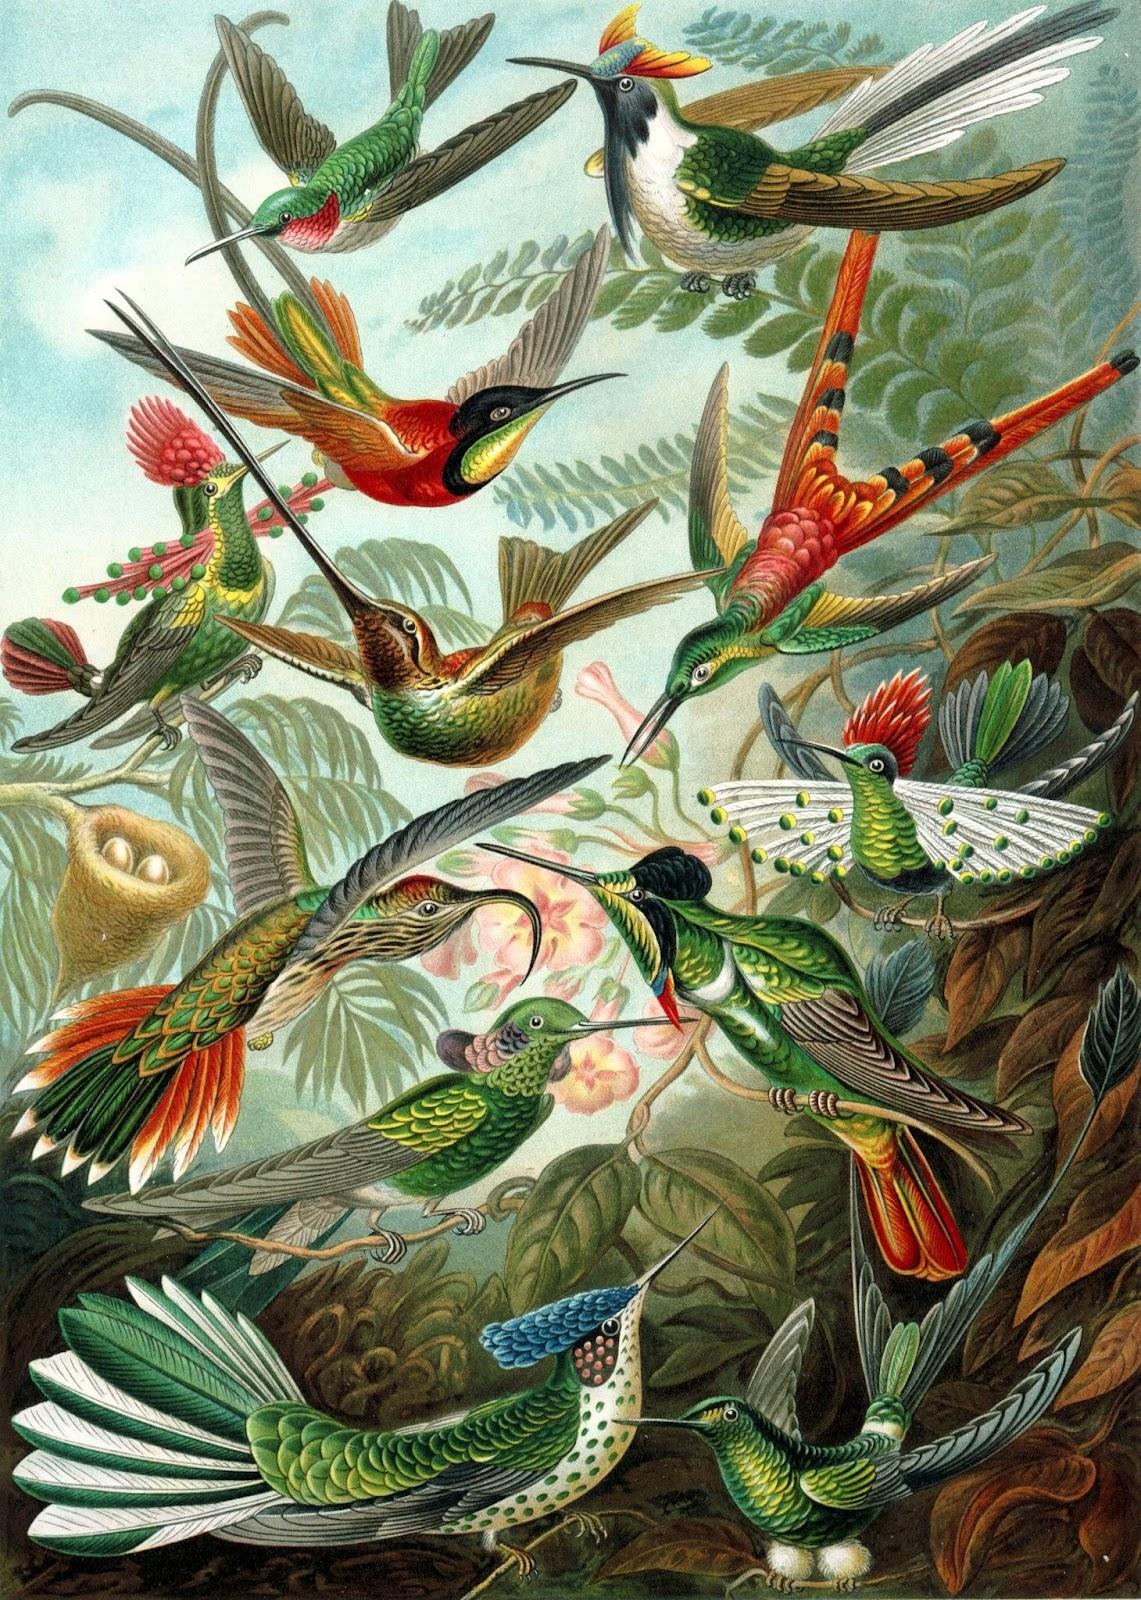 https://sites.google.com/hdsb.ca/maheshwari-biology/home/diversity-of-living-things